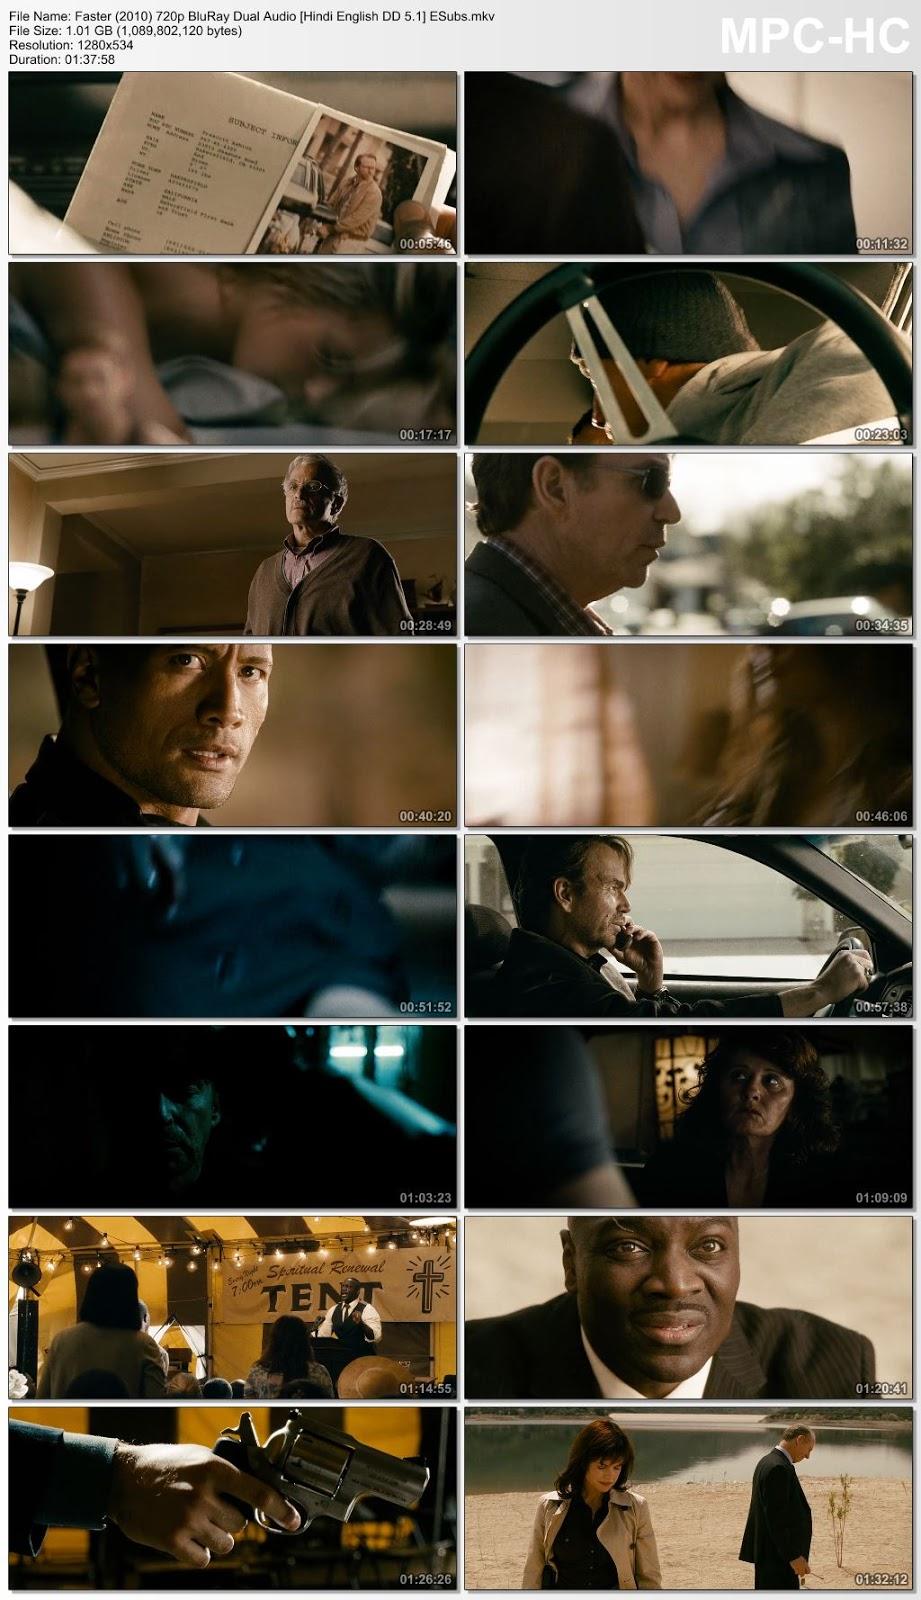 Faster (2010) 720p BluRay Dual Audio [Hindi – English DD 5.1] ESubs 1.1GB Desirehub